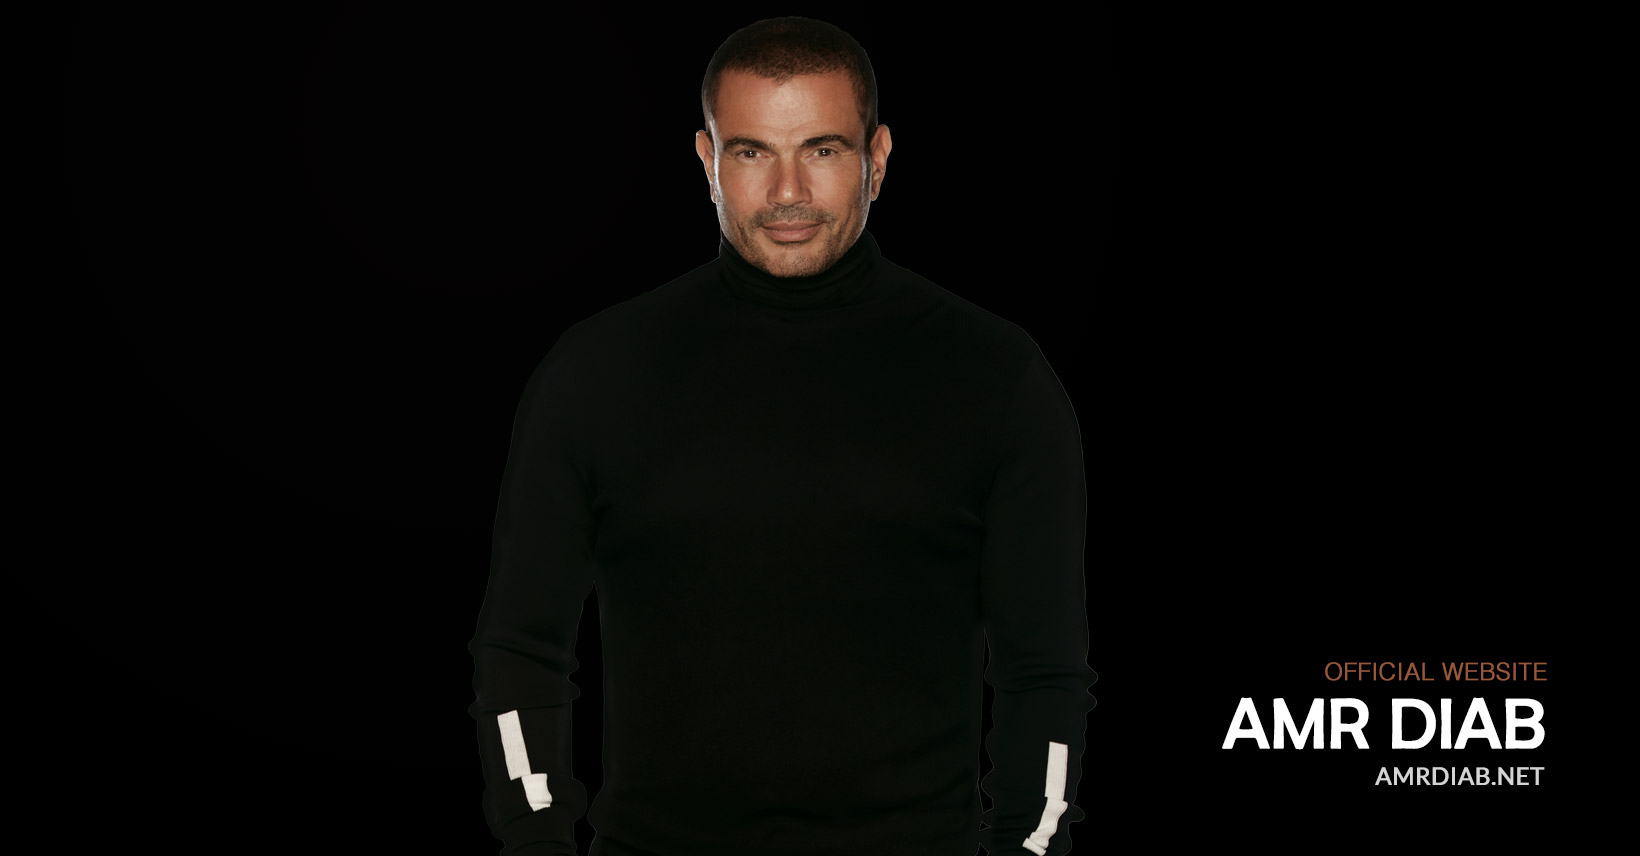 Amr Diab Official Website